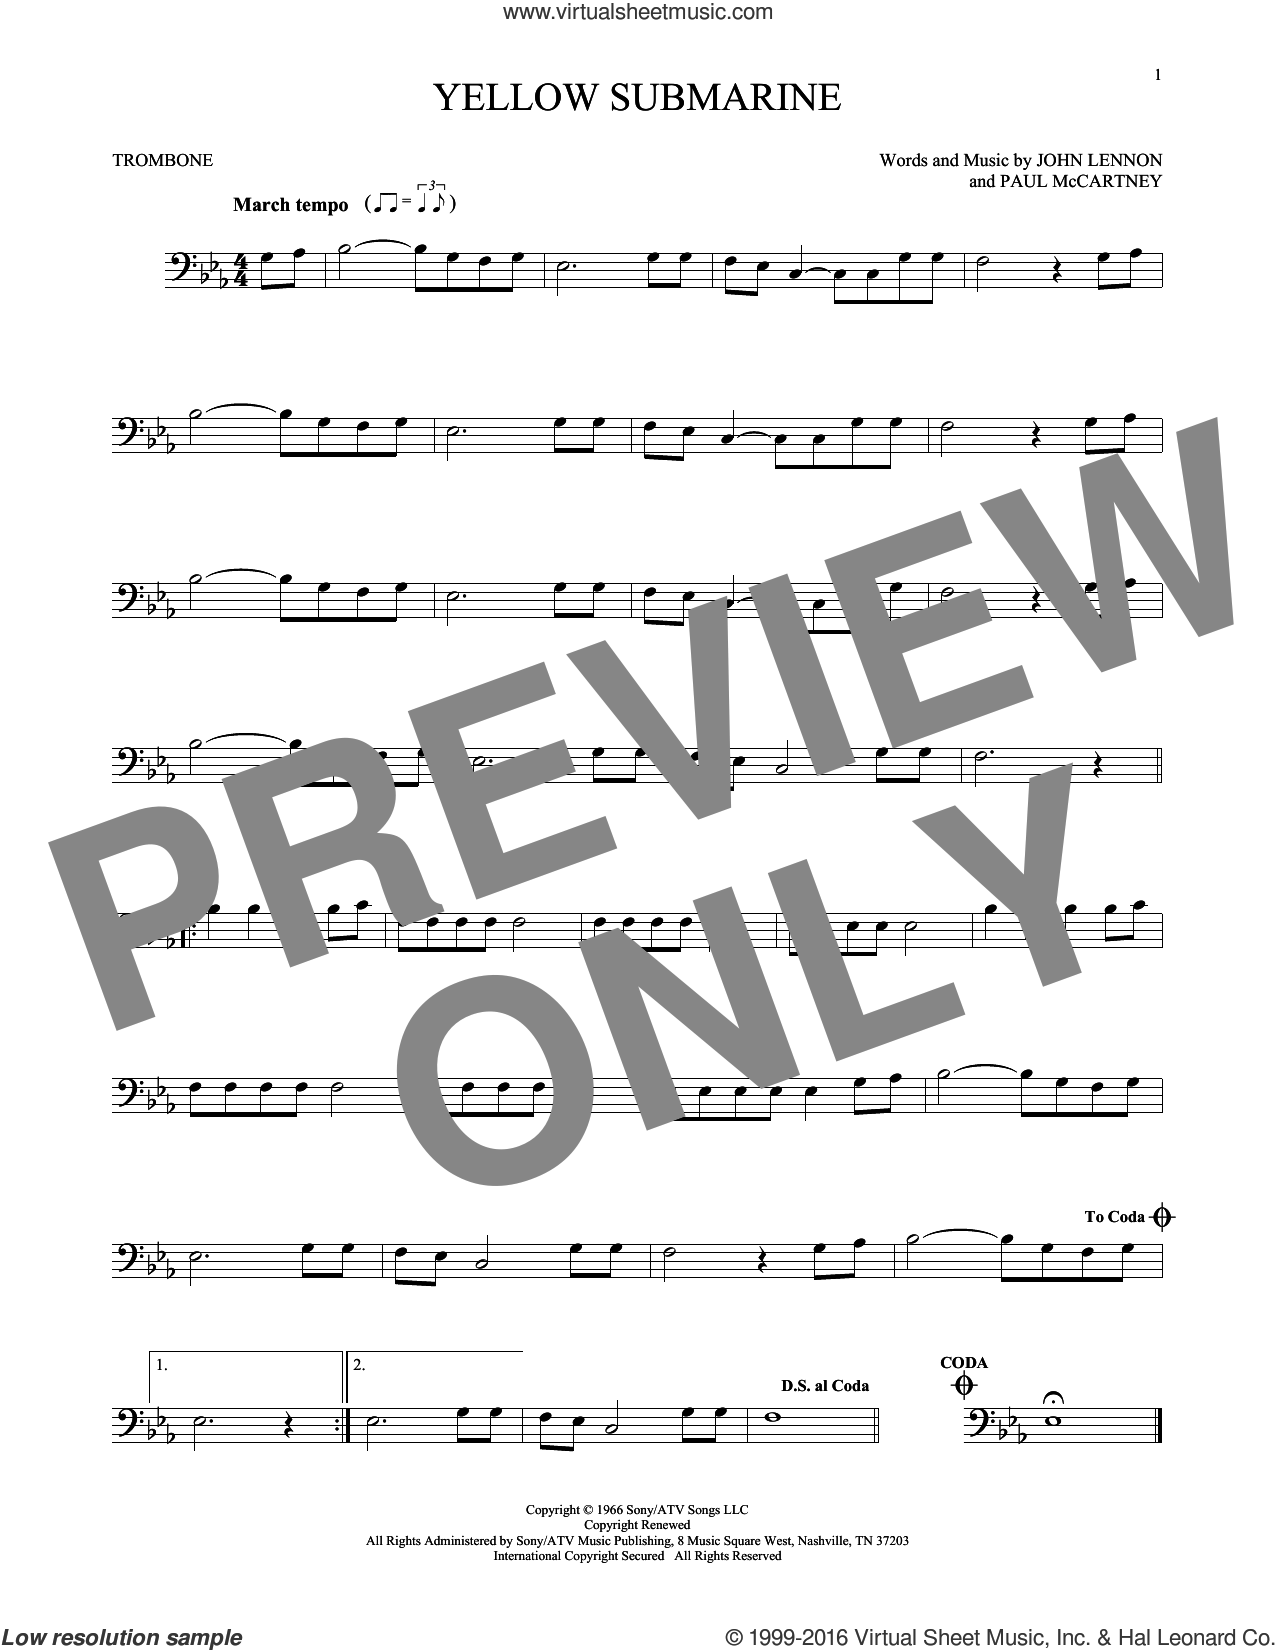 Yellow Submarine sheet music for trombone solo by The Beatles, John Lennon and Paul McCartney, intermediate skill level